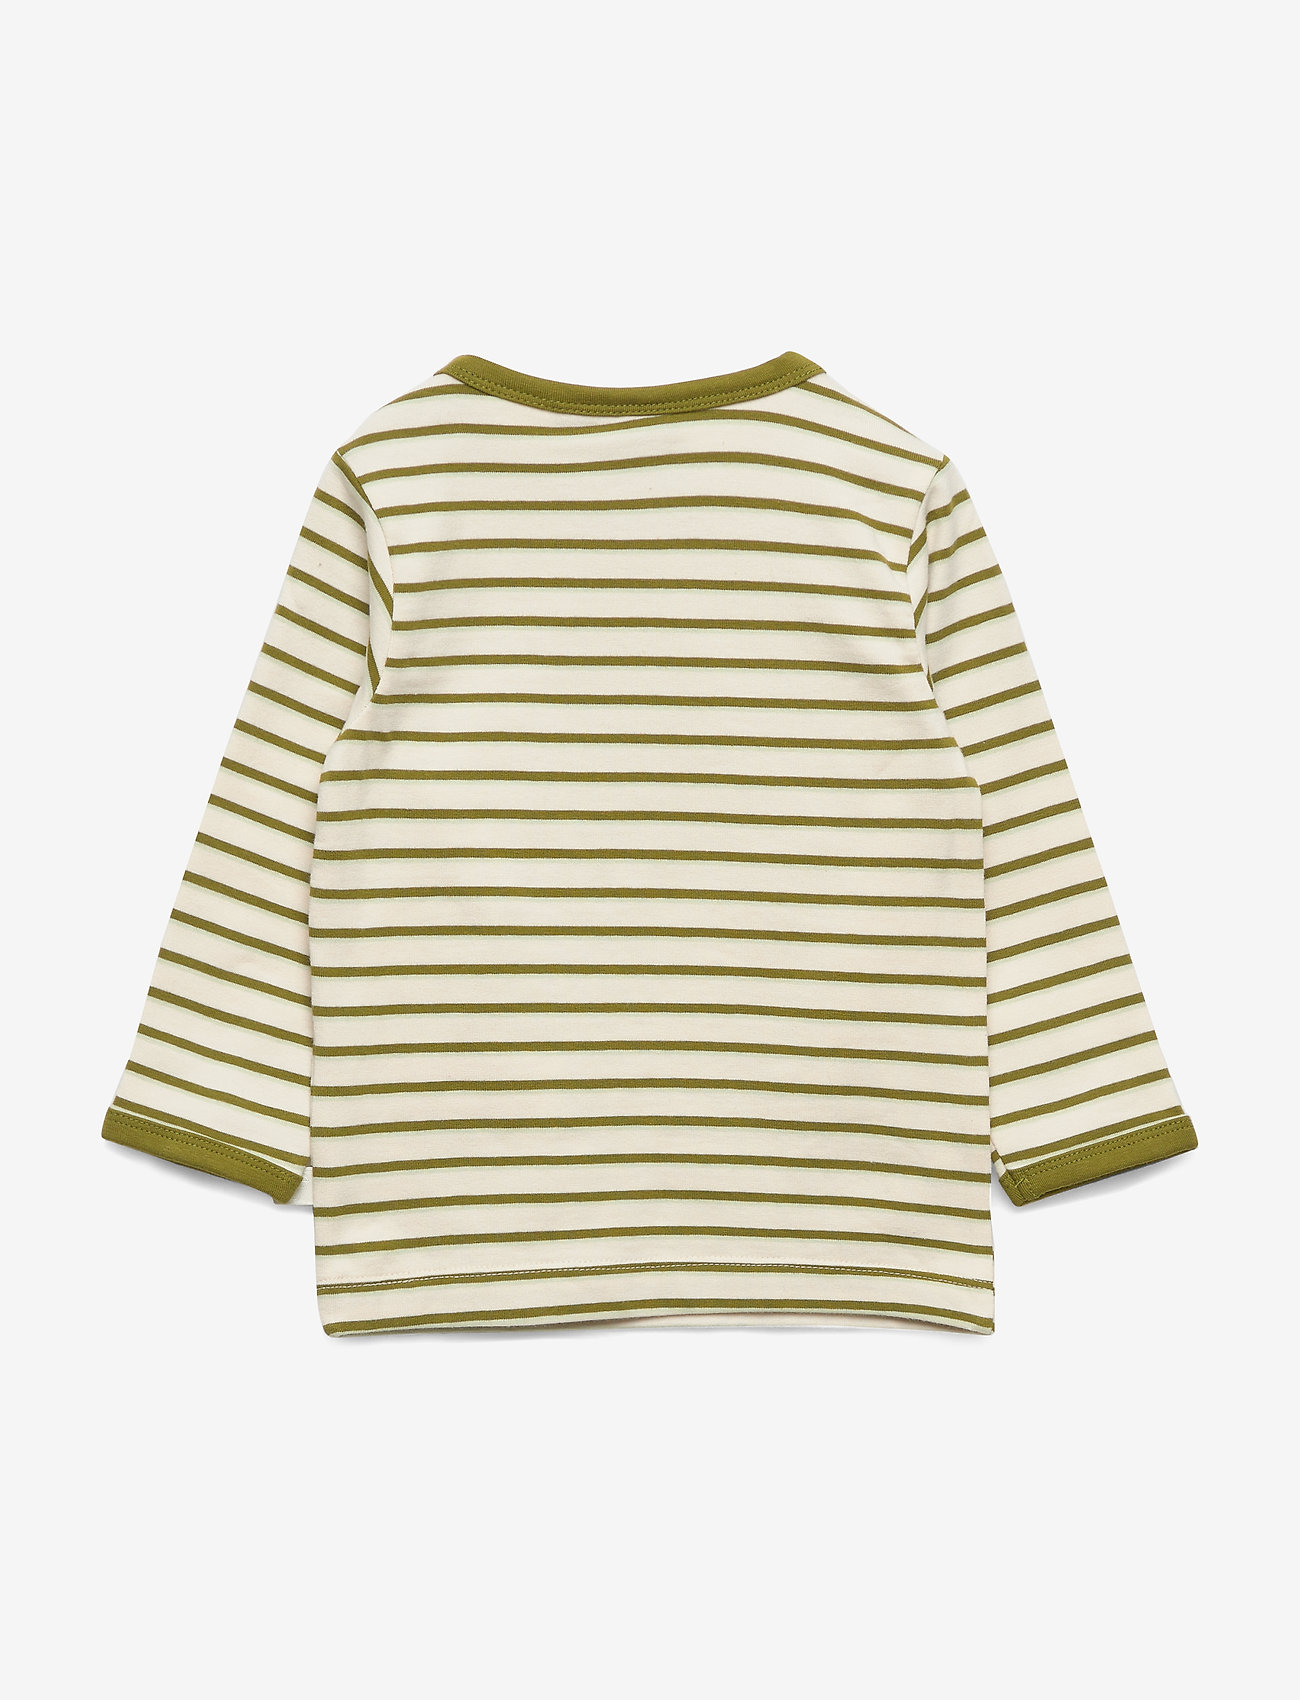 Hummel - hmlALAN T-SHIRT L/S - long-sleeved t-shirts - pesto - 1